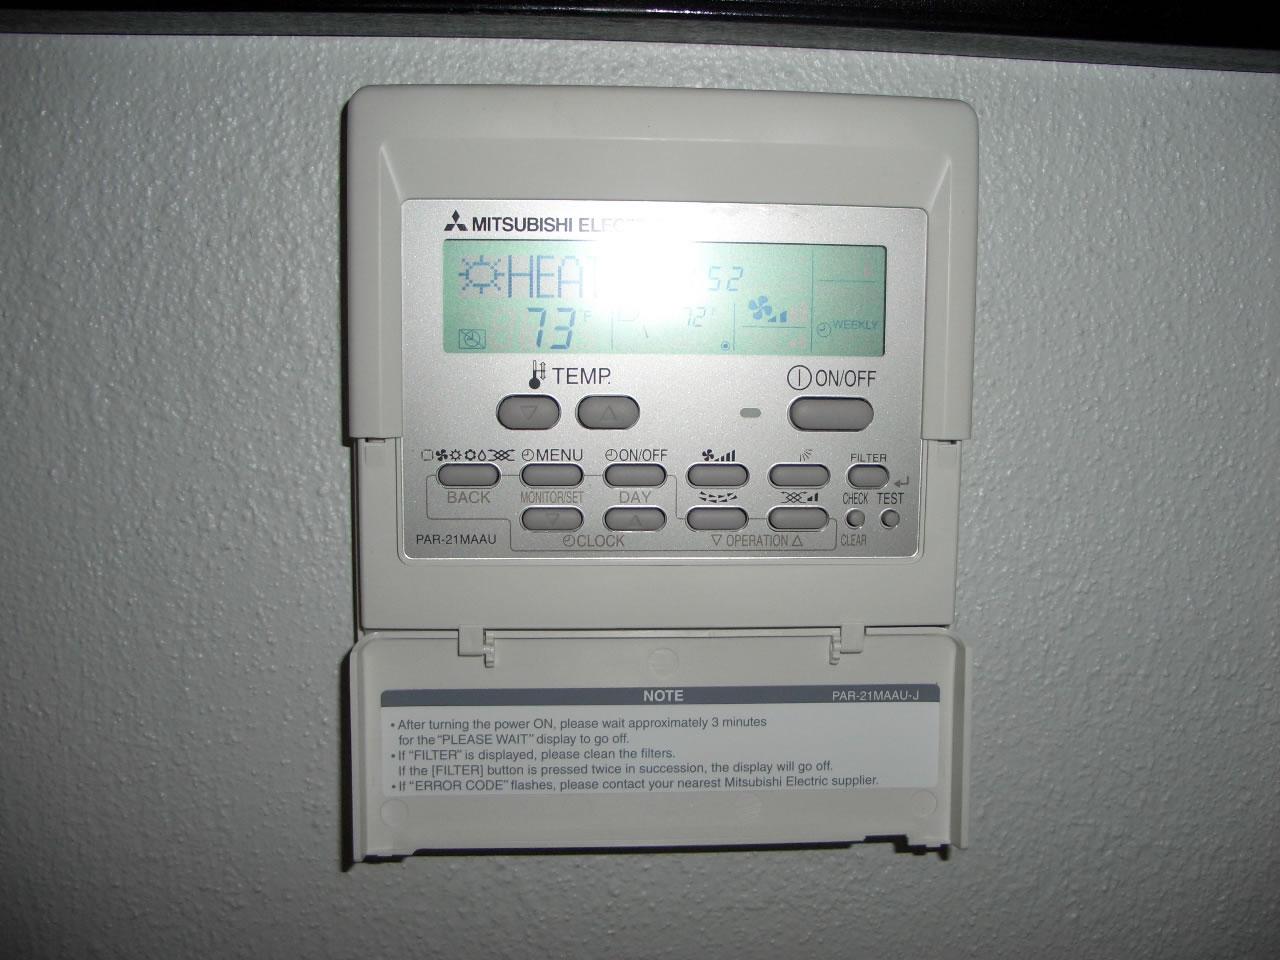 Mitsubishi Mr Slim Par 20maa Remote Controller Air Conditioner